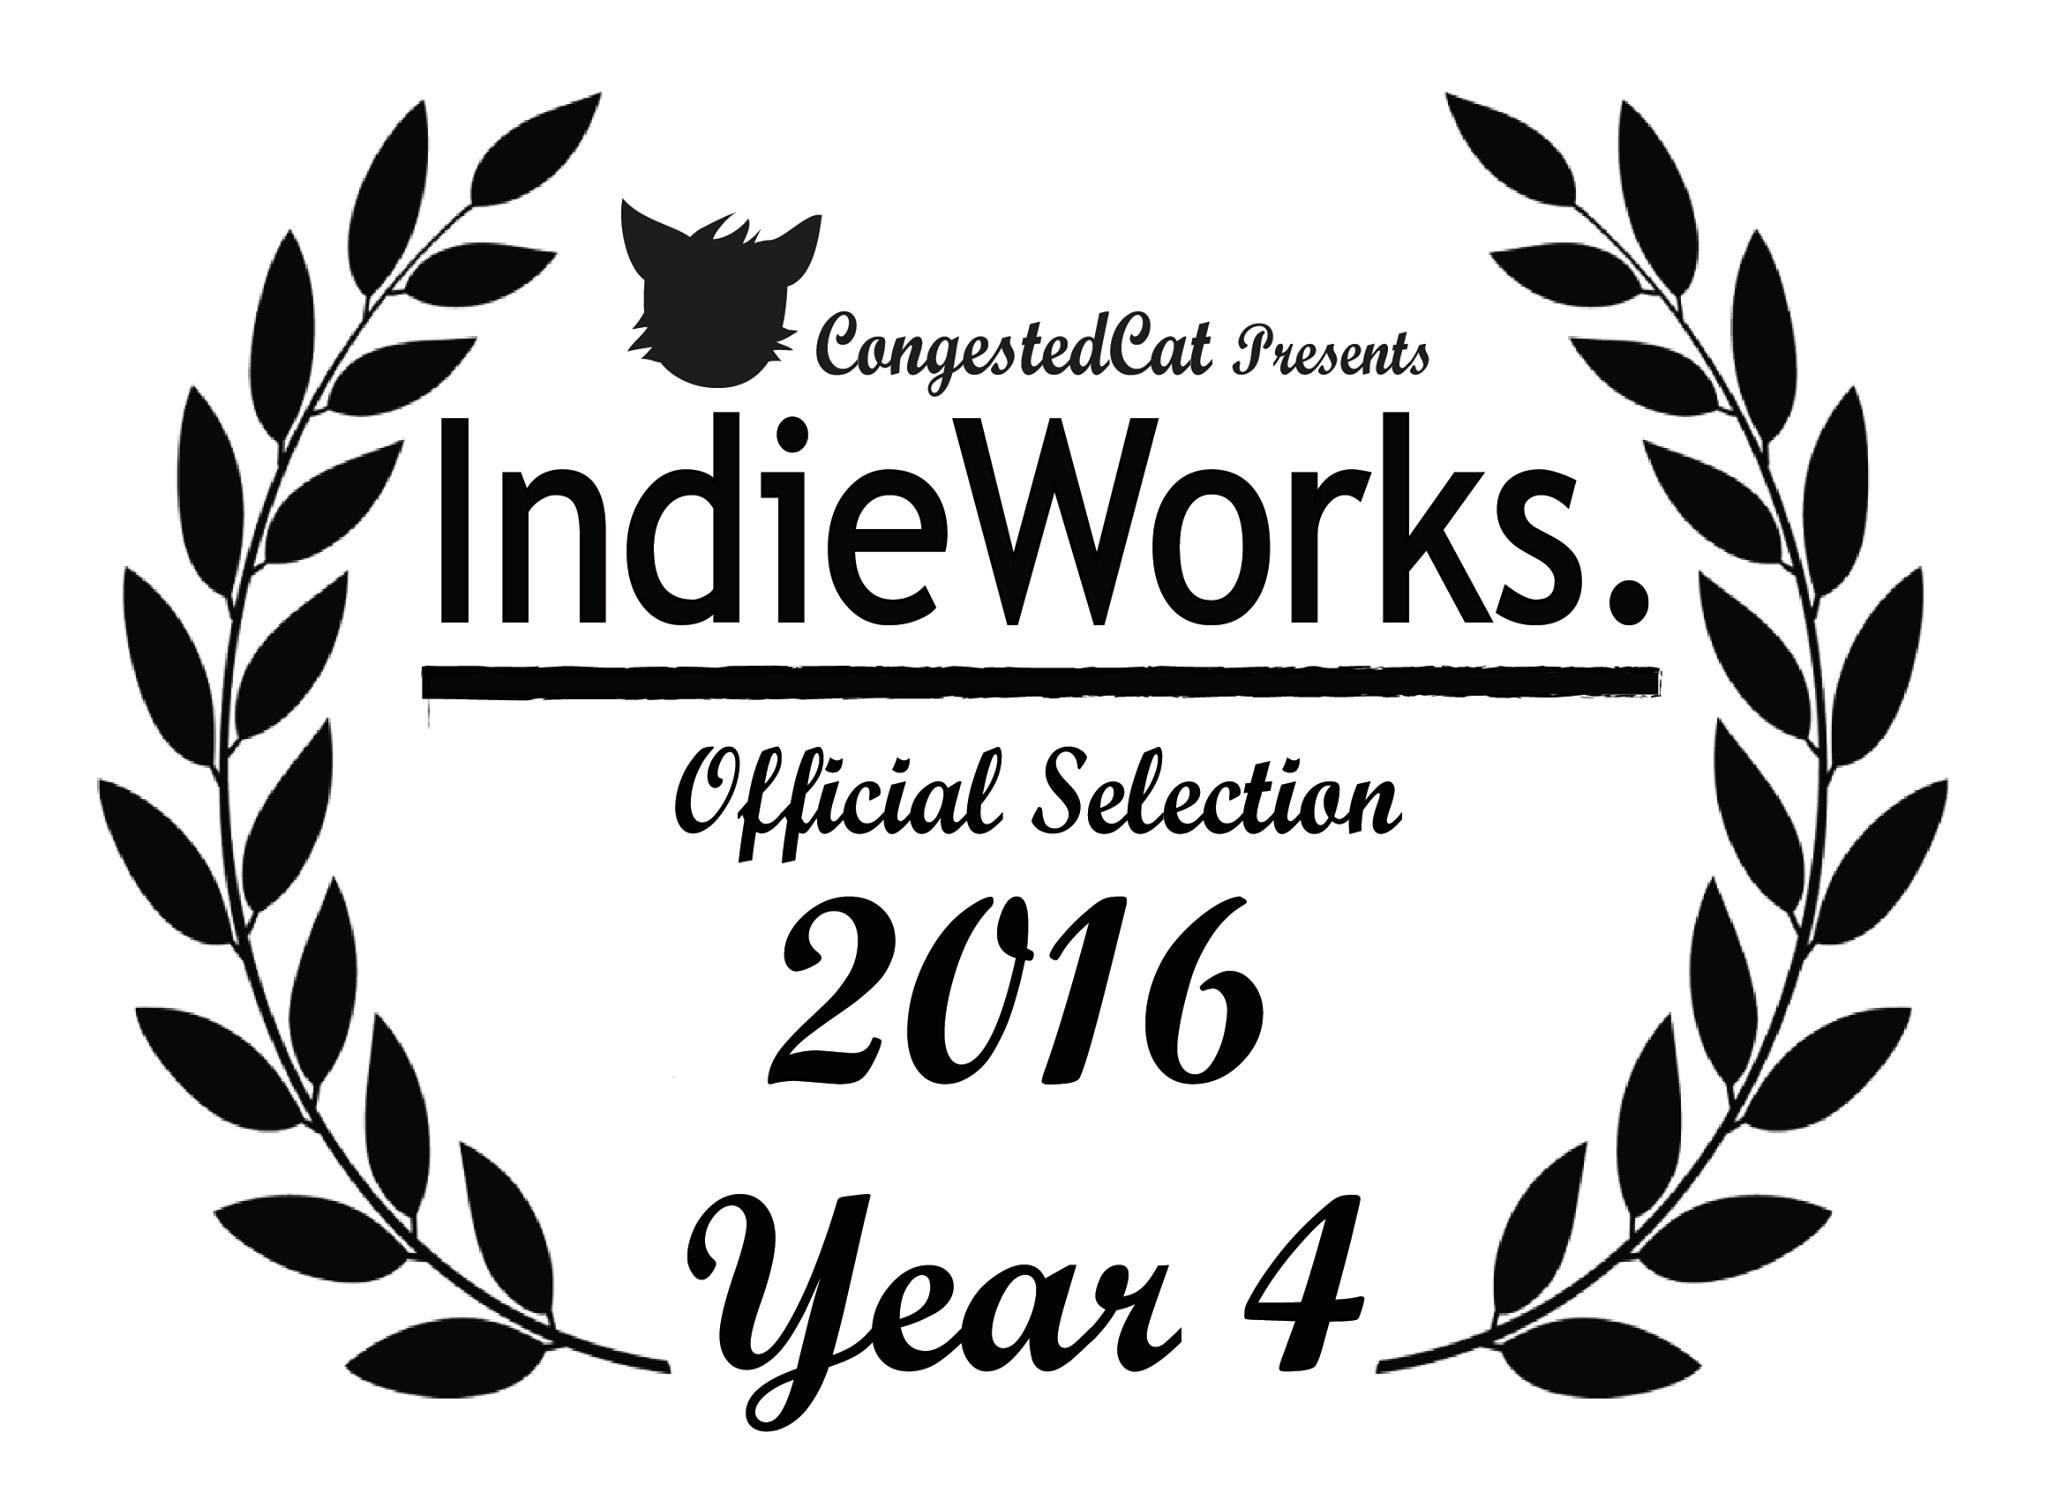 IndieworksLaurel.png